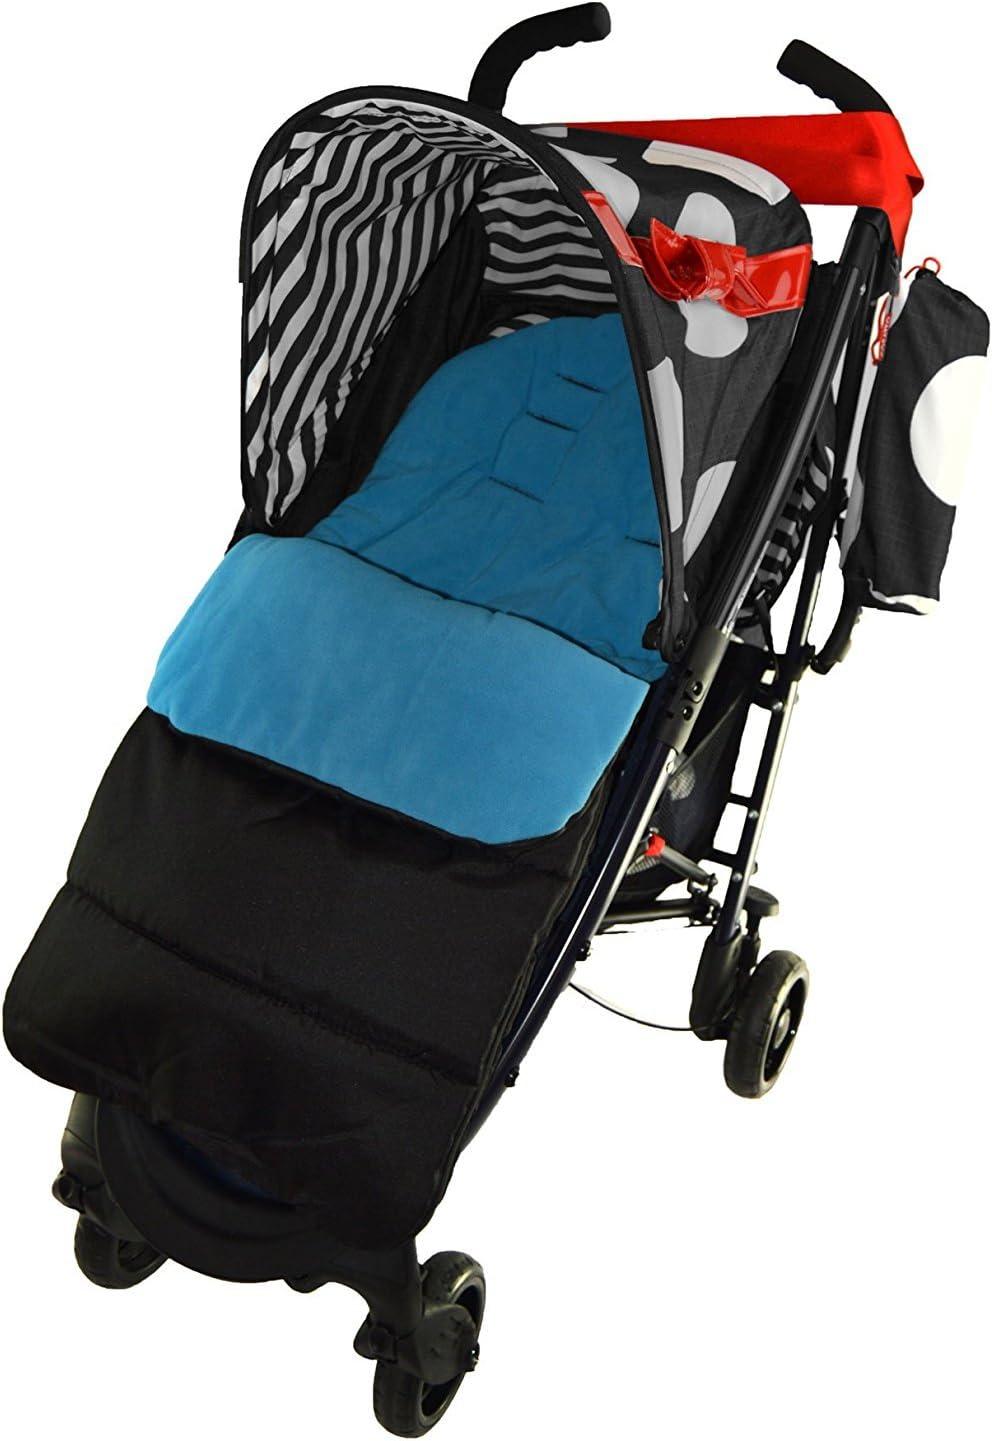 Footmuff//Cosy Toes Compatible with Maclaren Quest Sport Pushchair Ocean Blue